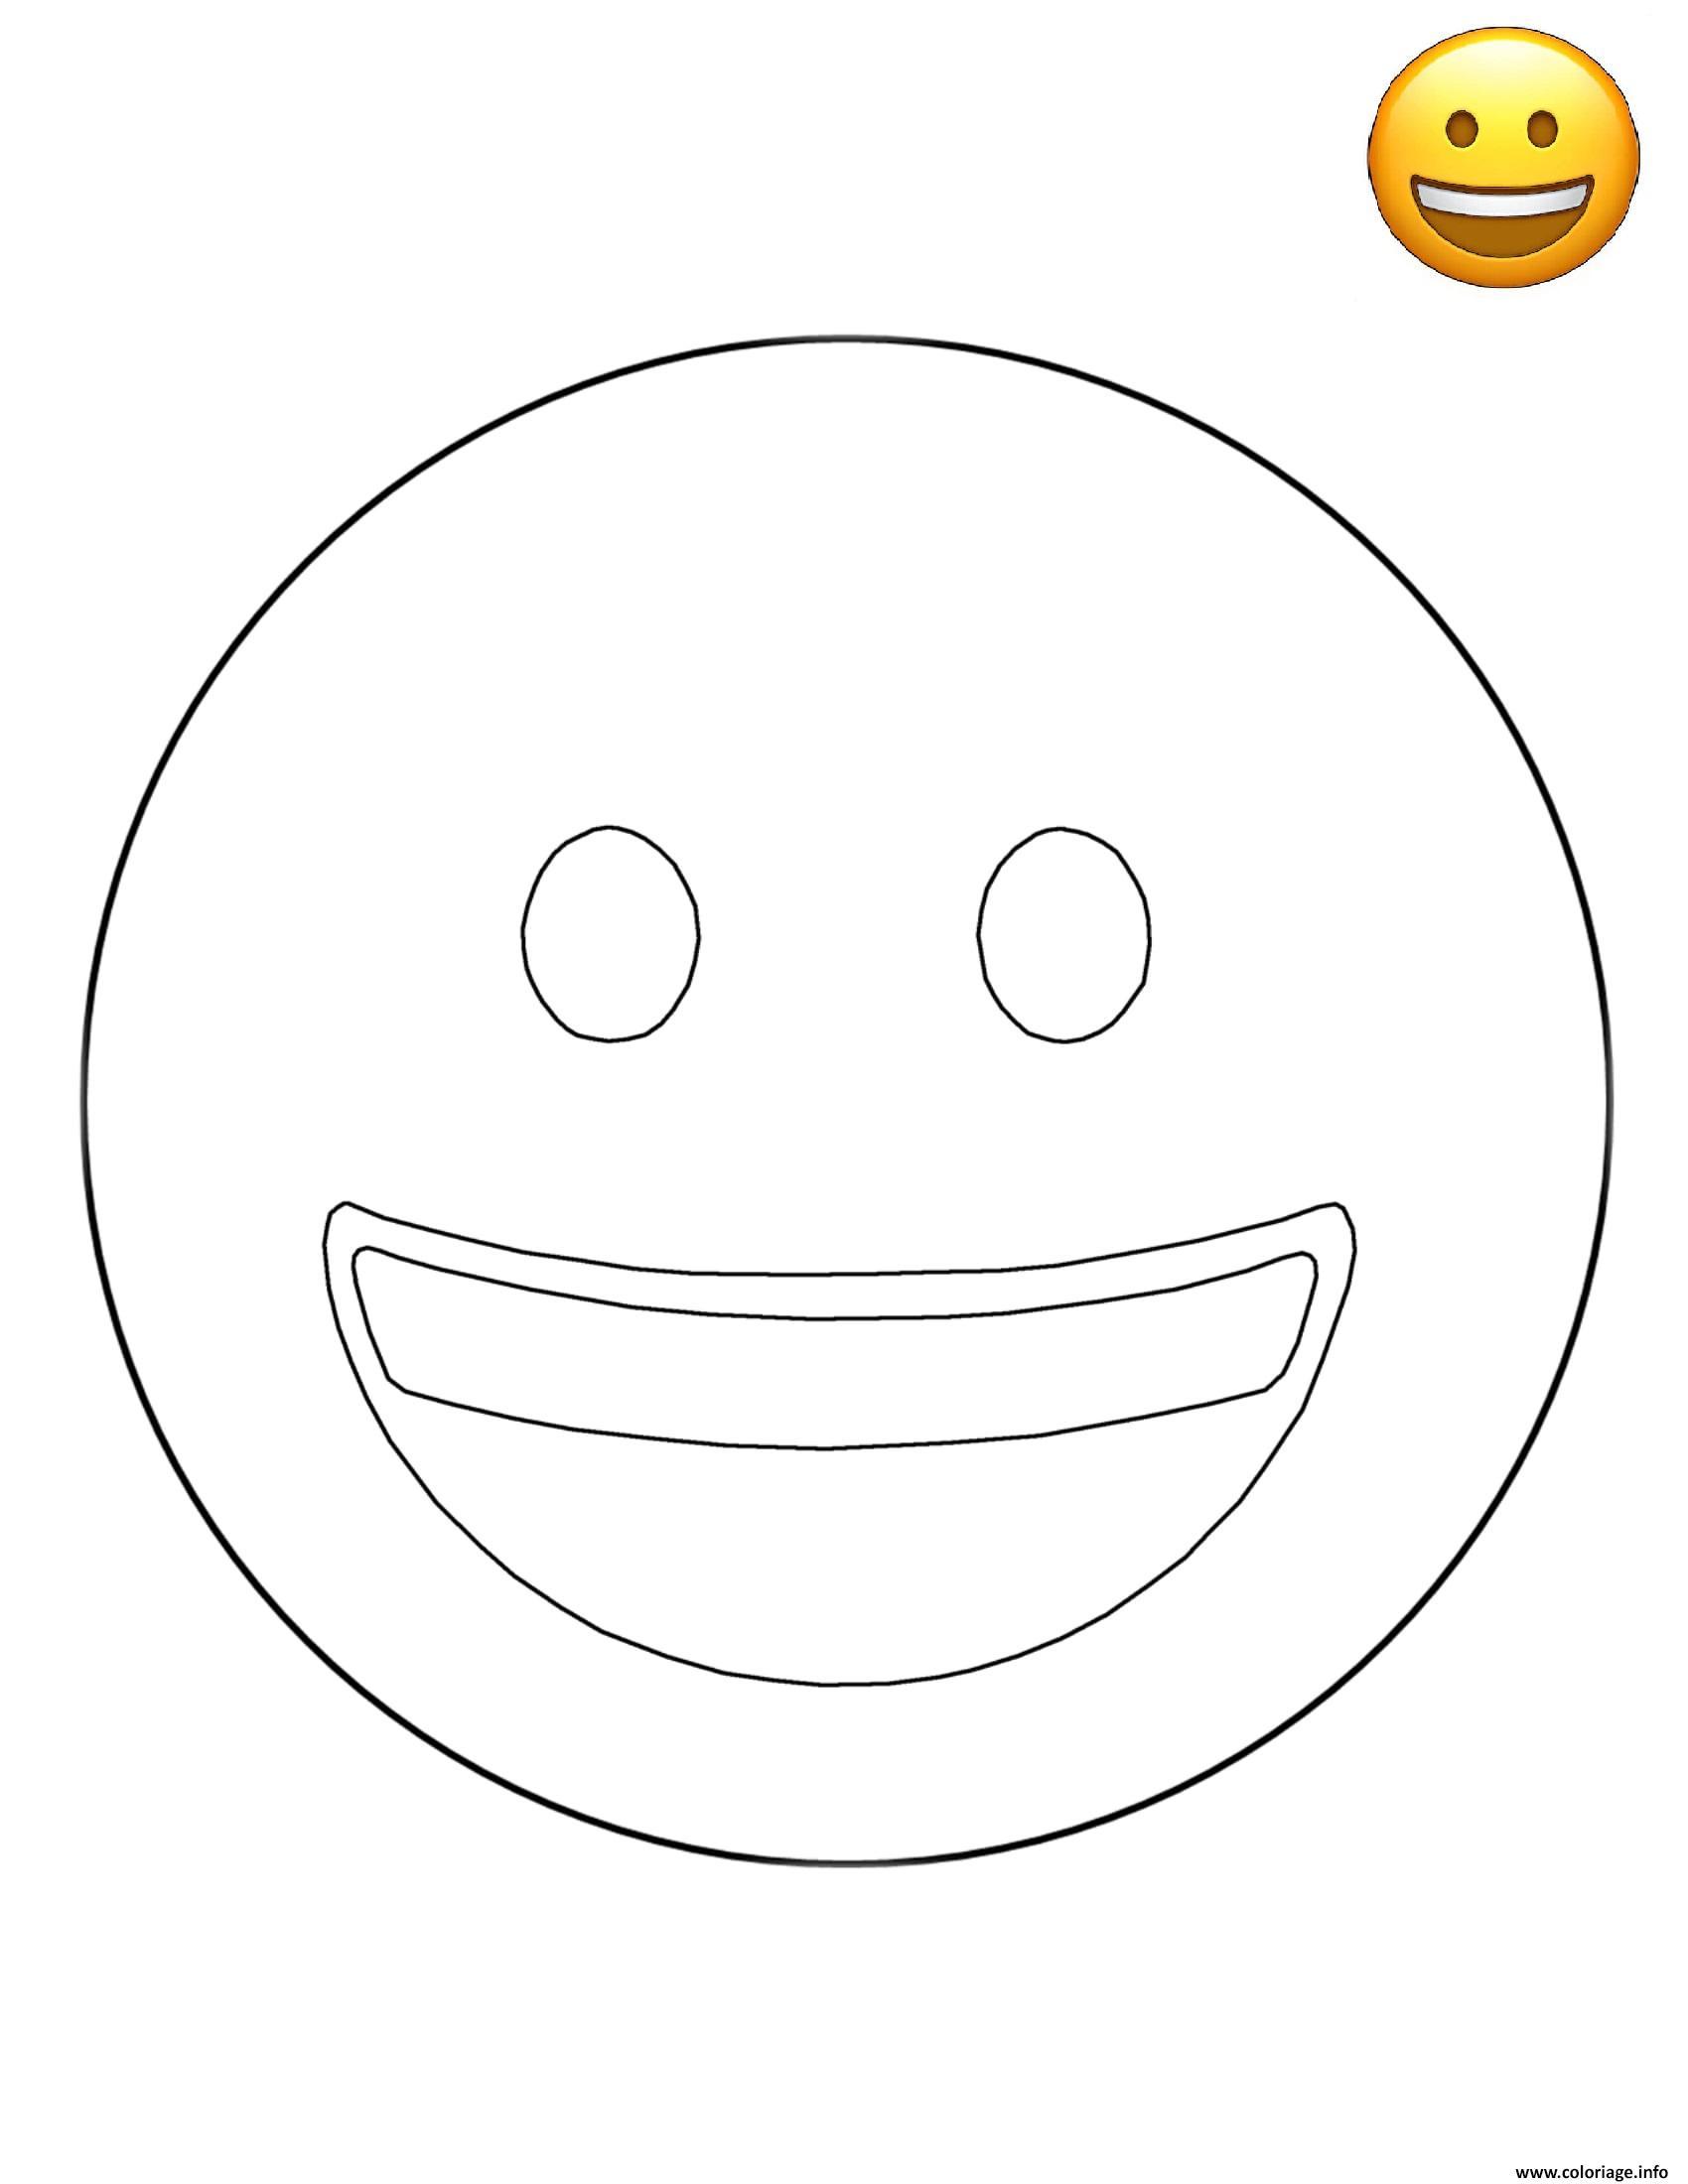 Coloriage emoji smiling face smiley dessin - Smiley a imprimer ...